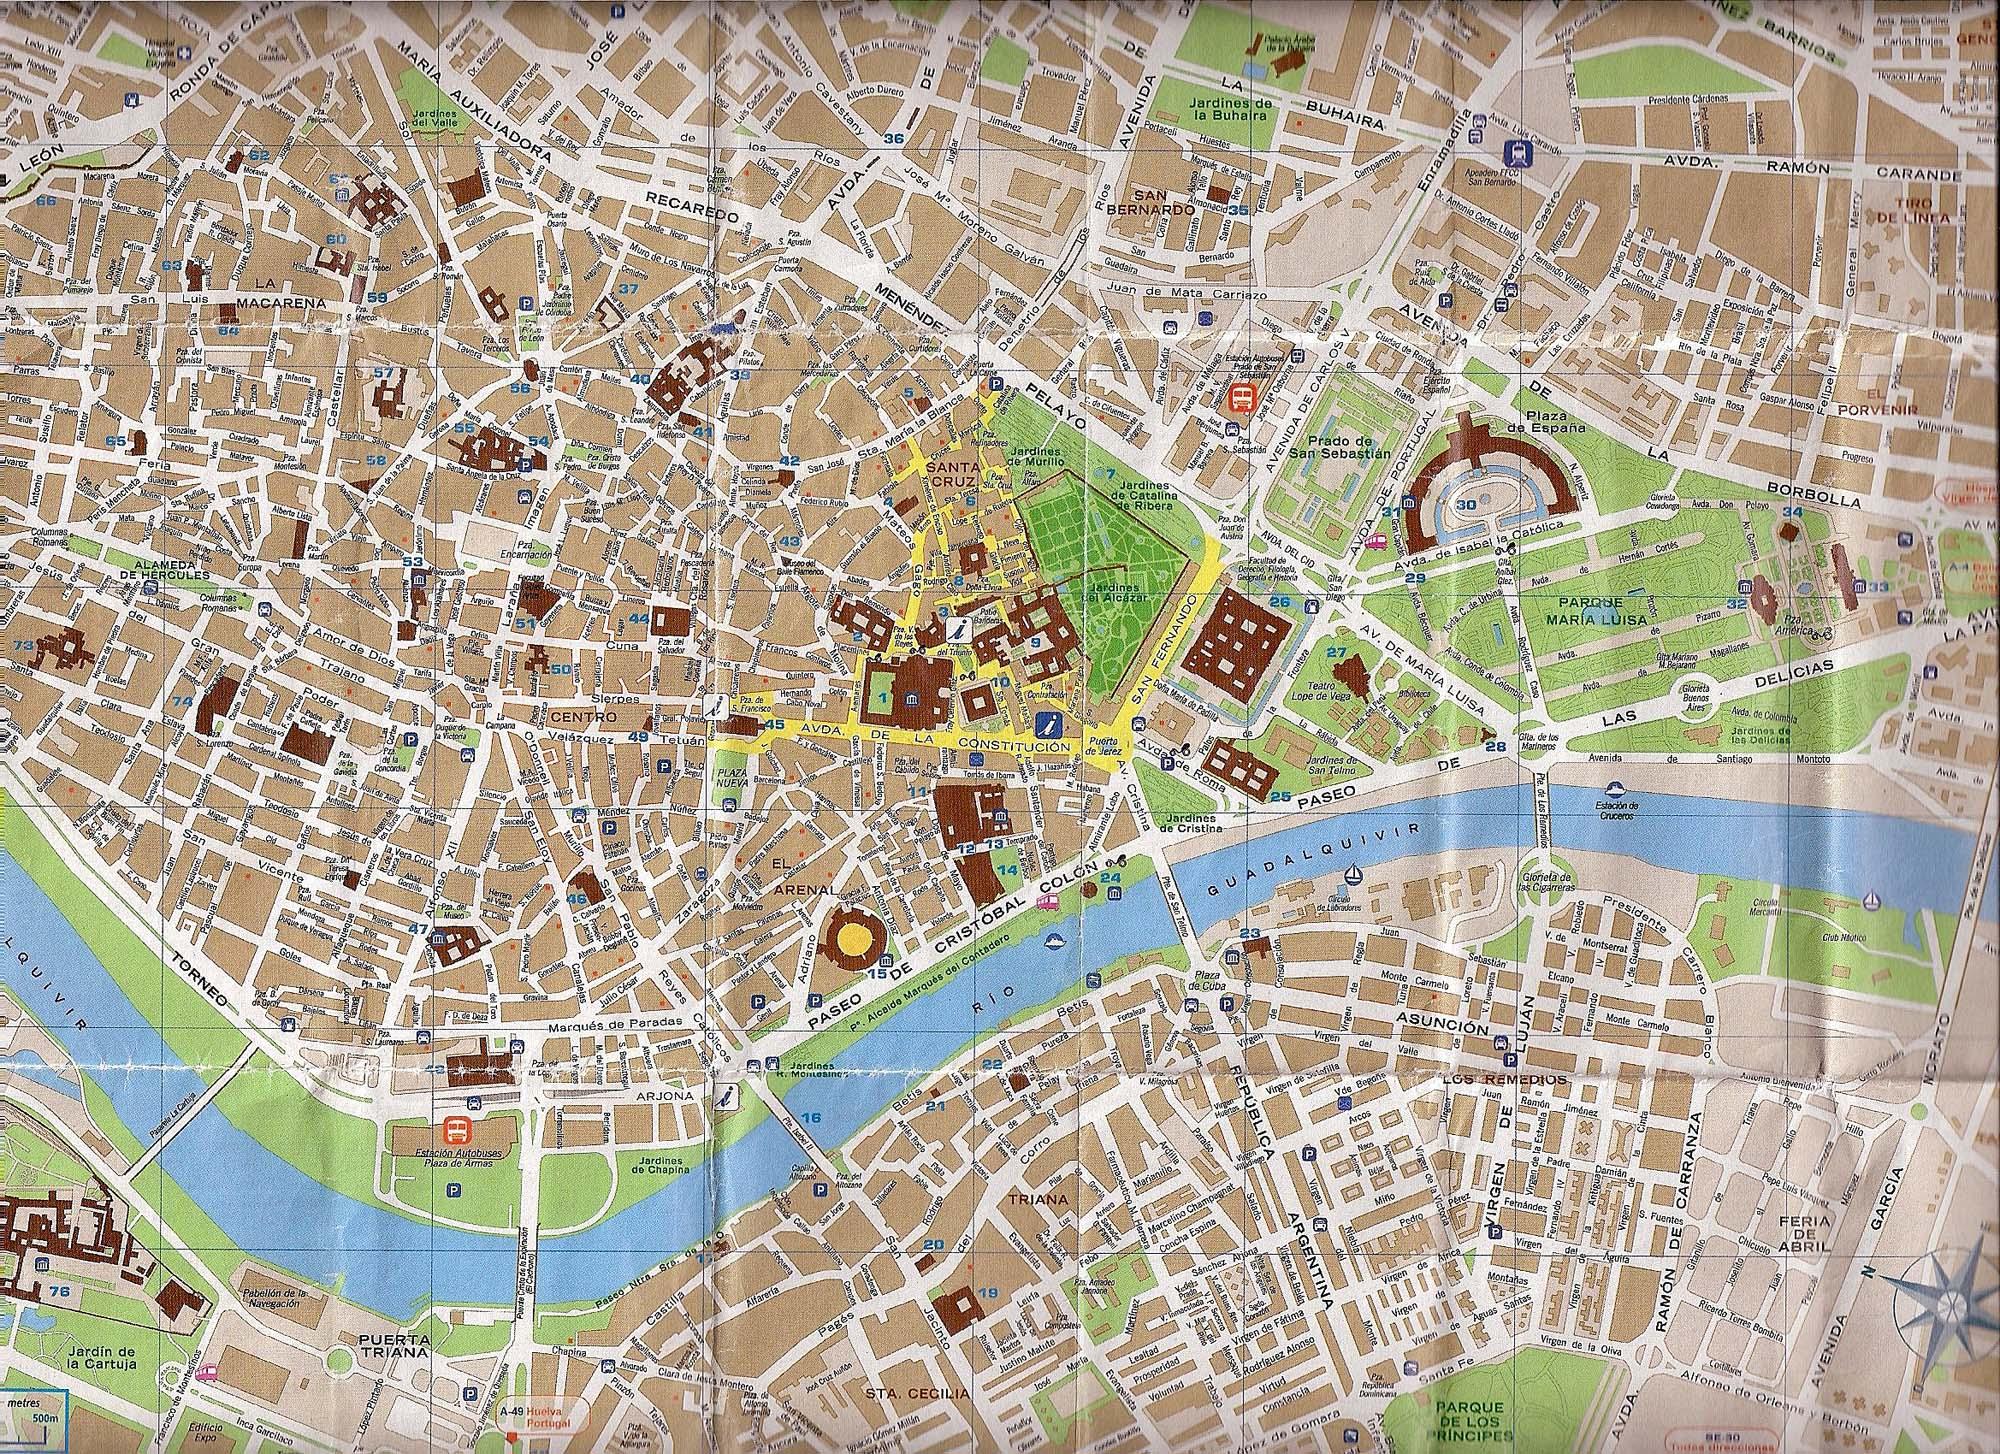 Mapa De La Ciudad De Sevilla Mapa Owje Com